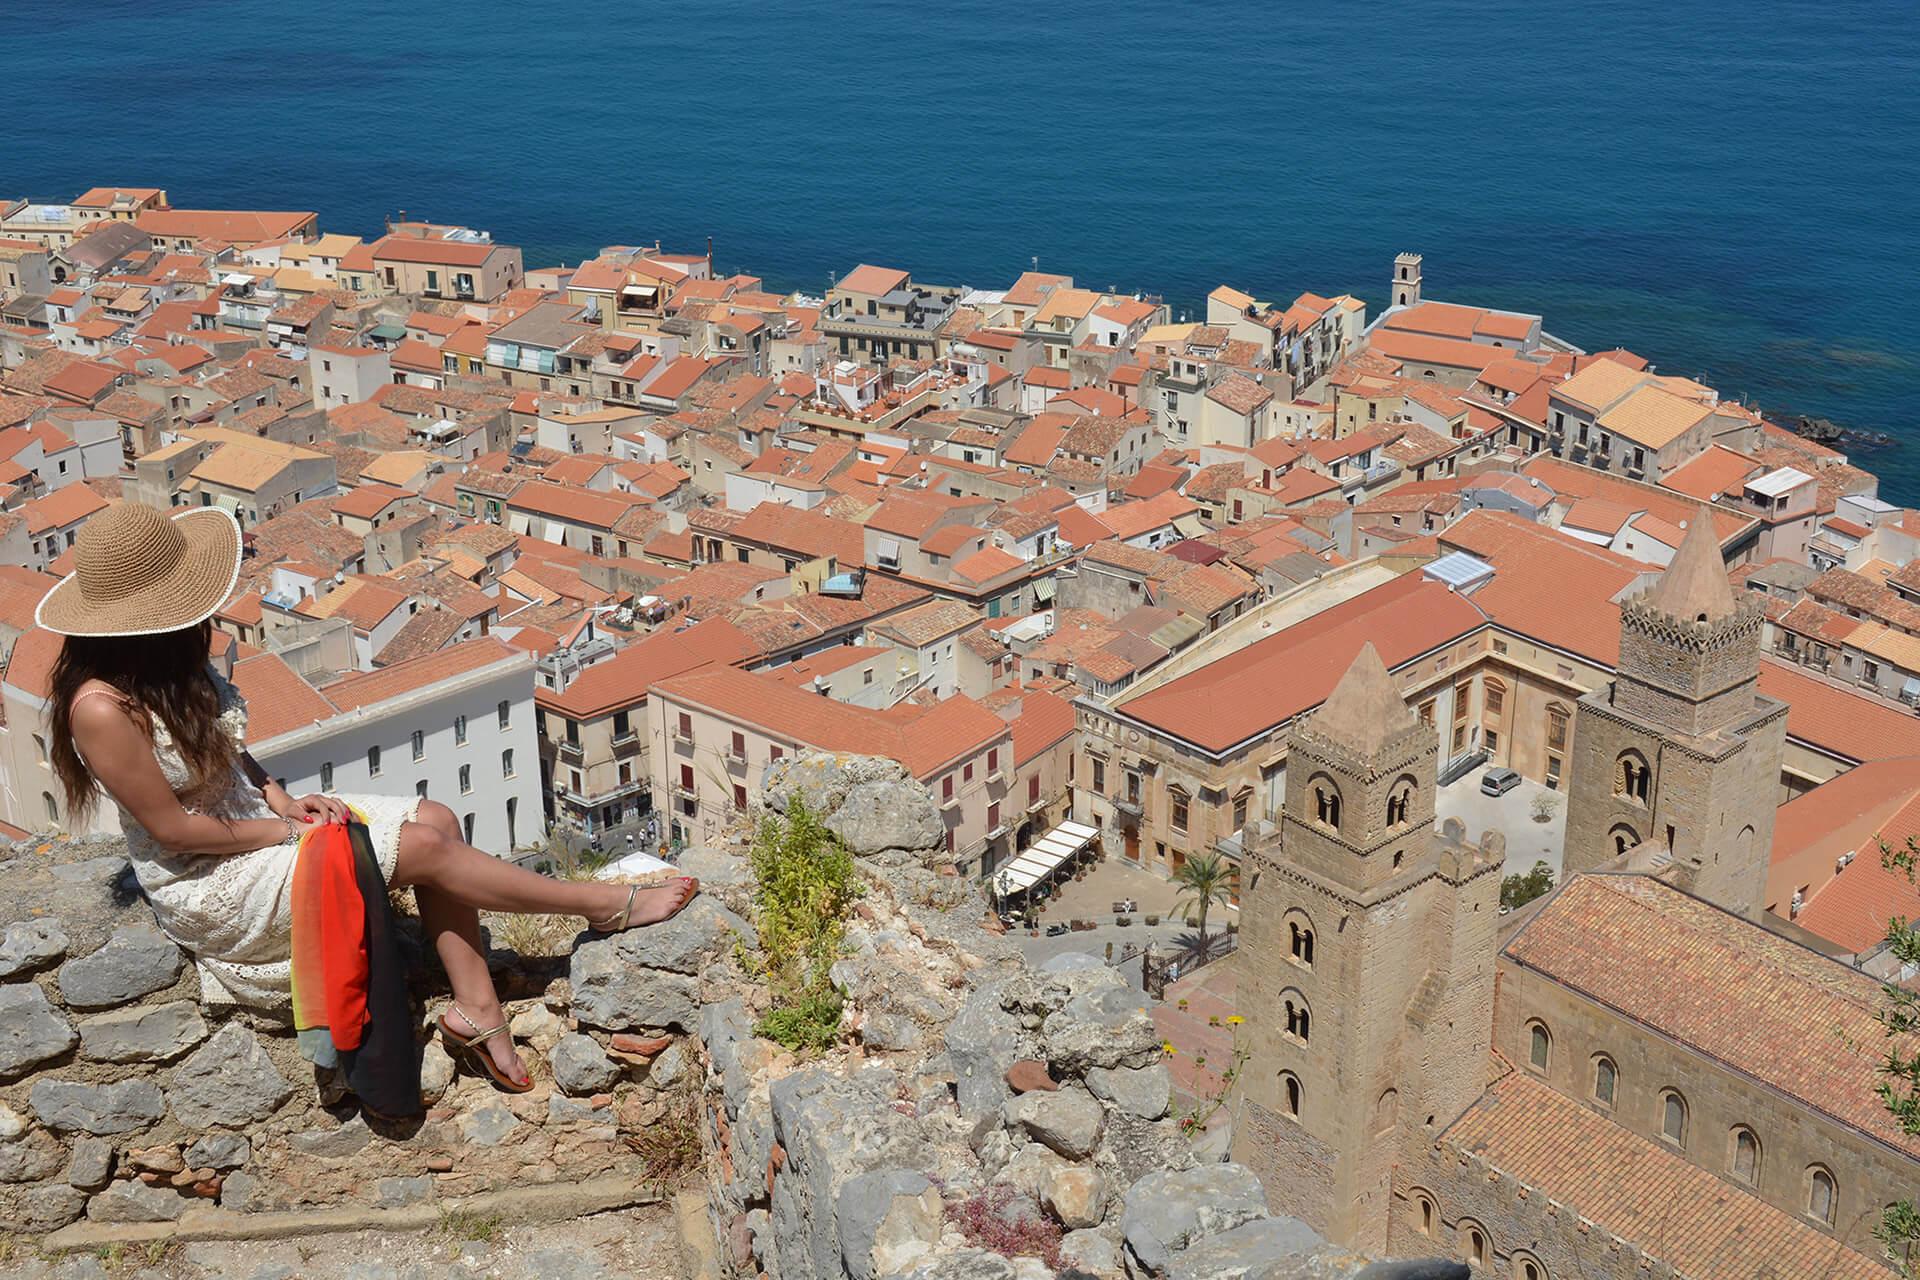 rocca-cefalu-cattedrale-featured